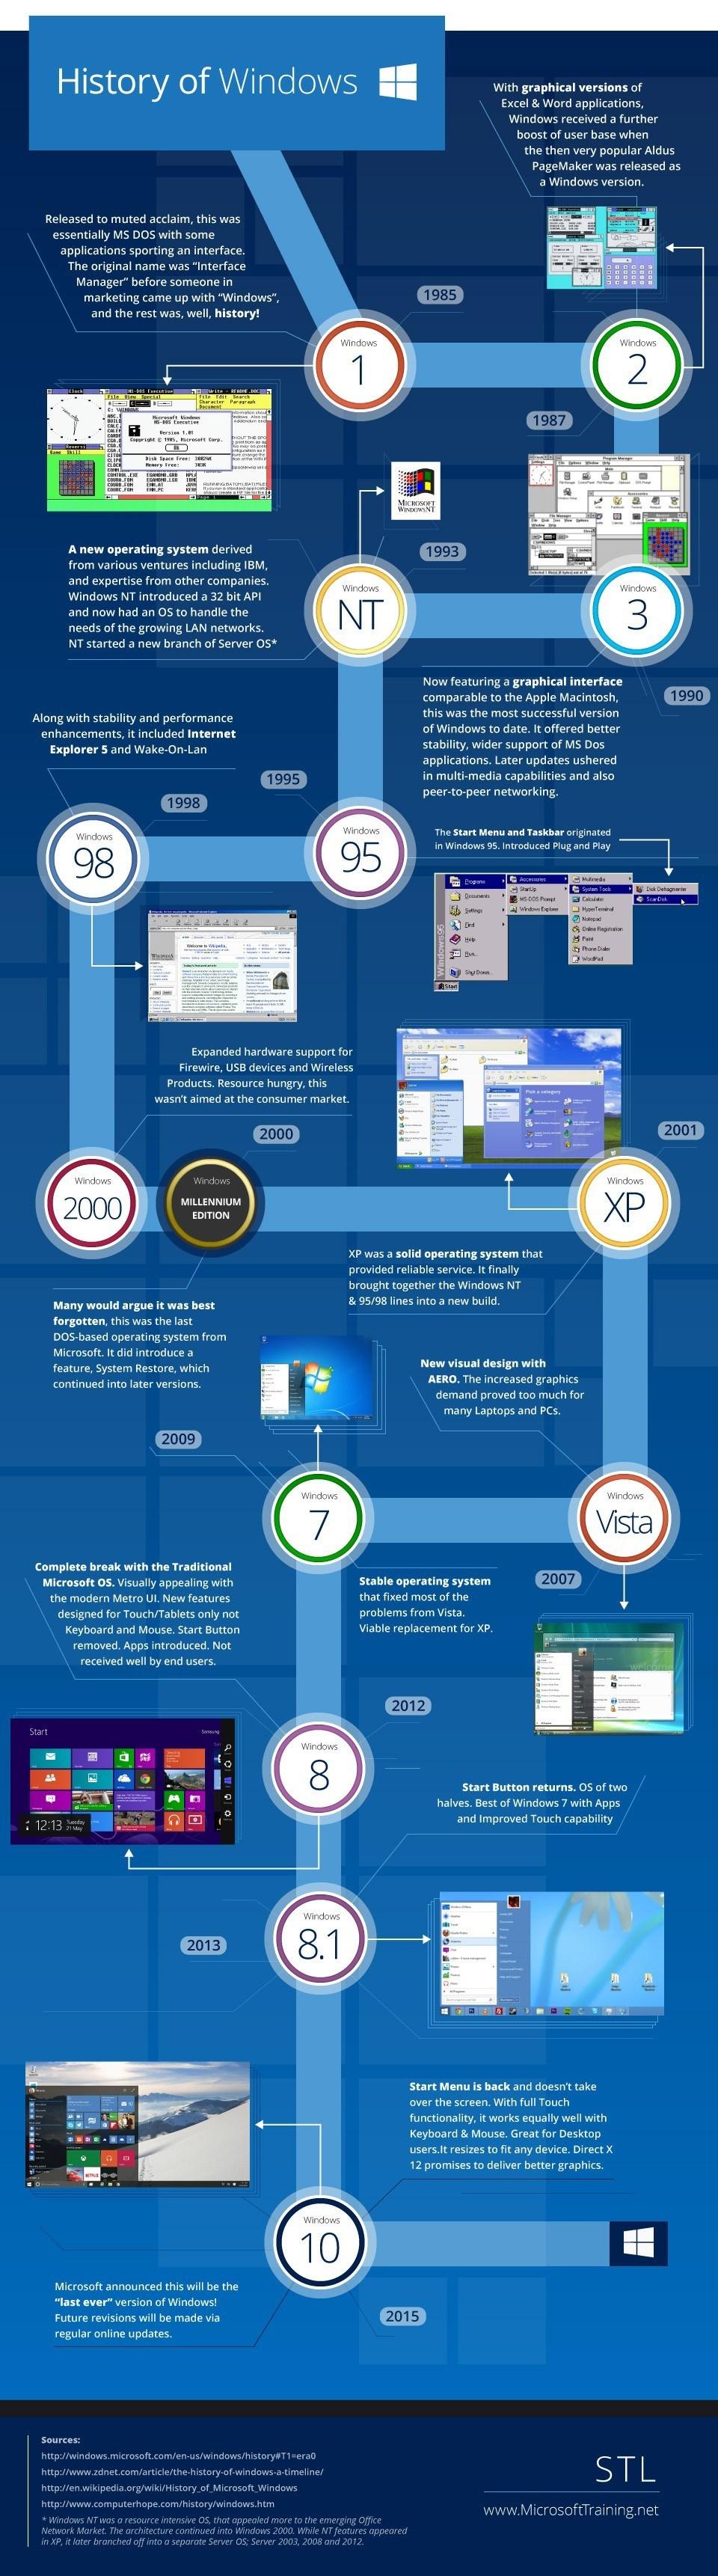 Daftar Versi Microsoft Windows